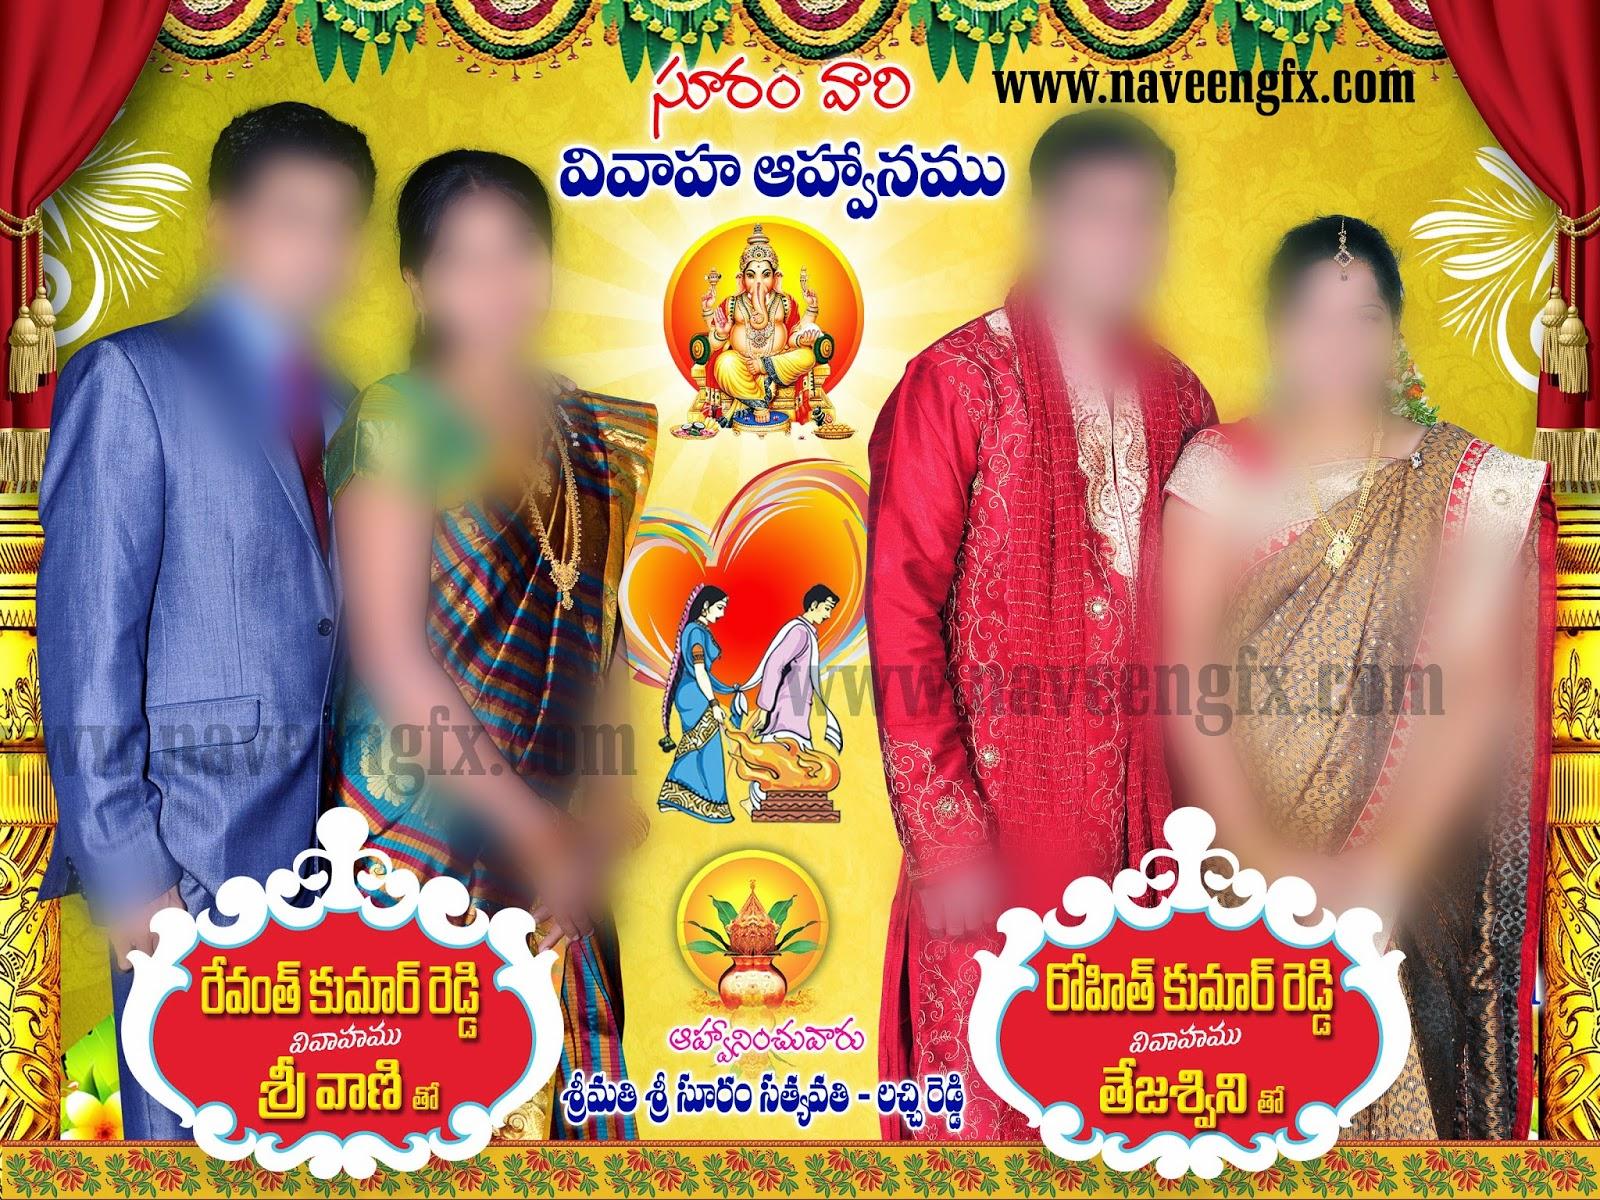 Indian Wedding Flex Banner Psd File Free Downloads Naveengfx